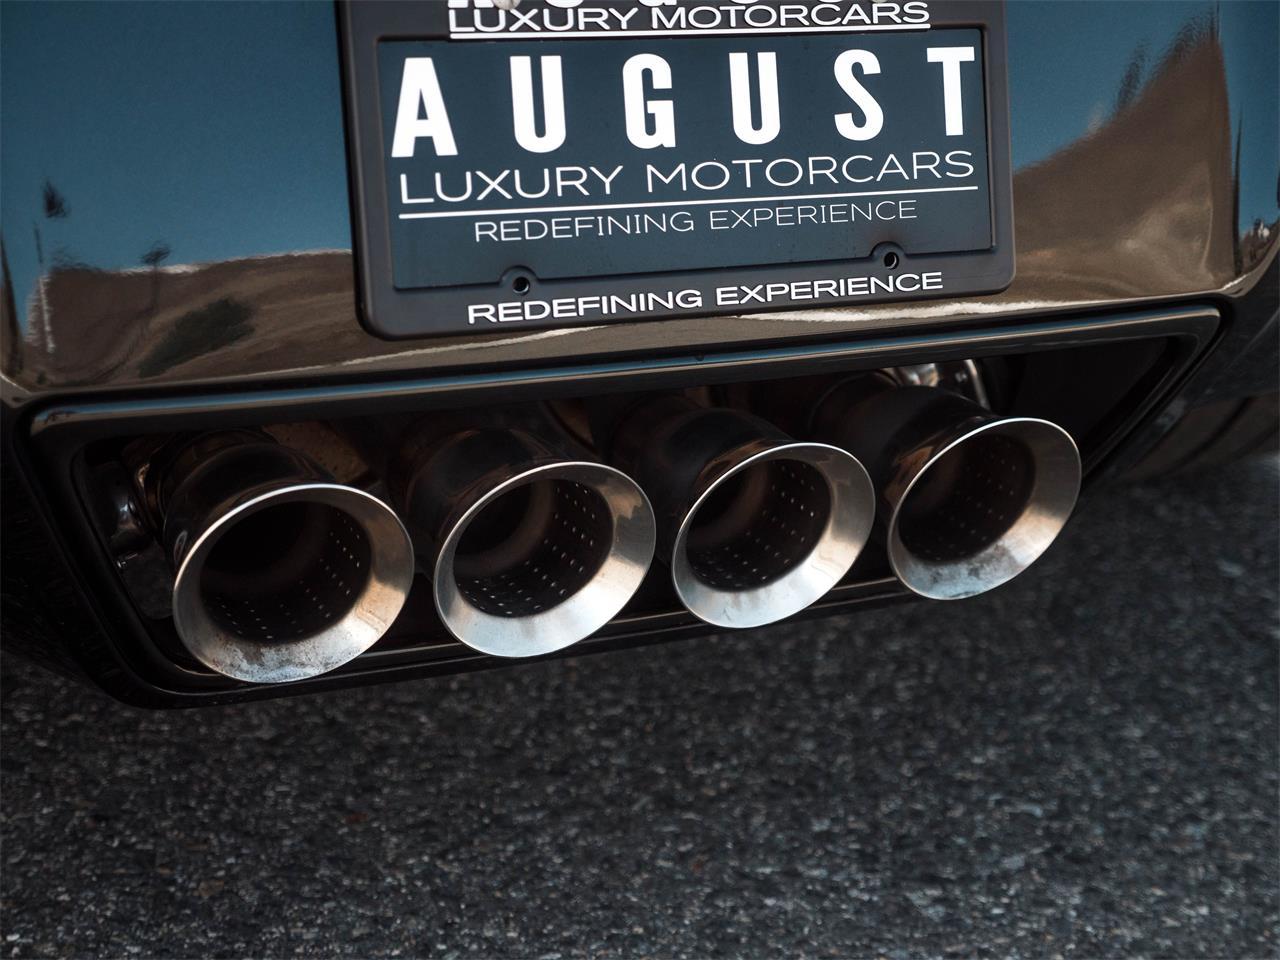 2019 Chevrolet Corvette (CC-1333186) for sale in Kelowna, British Columbia